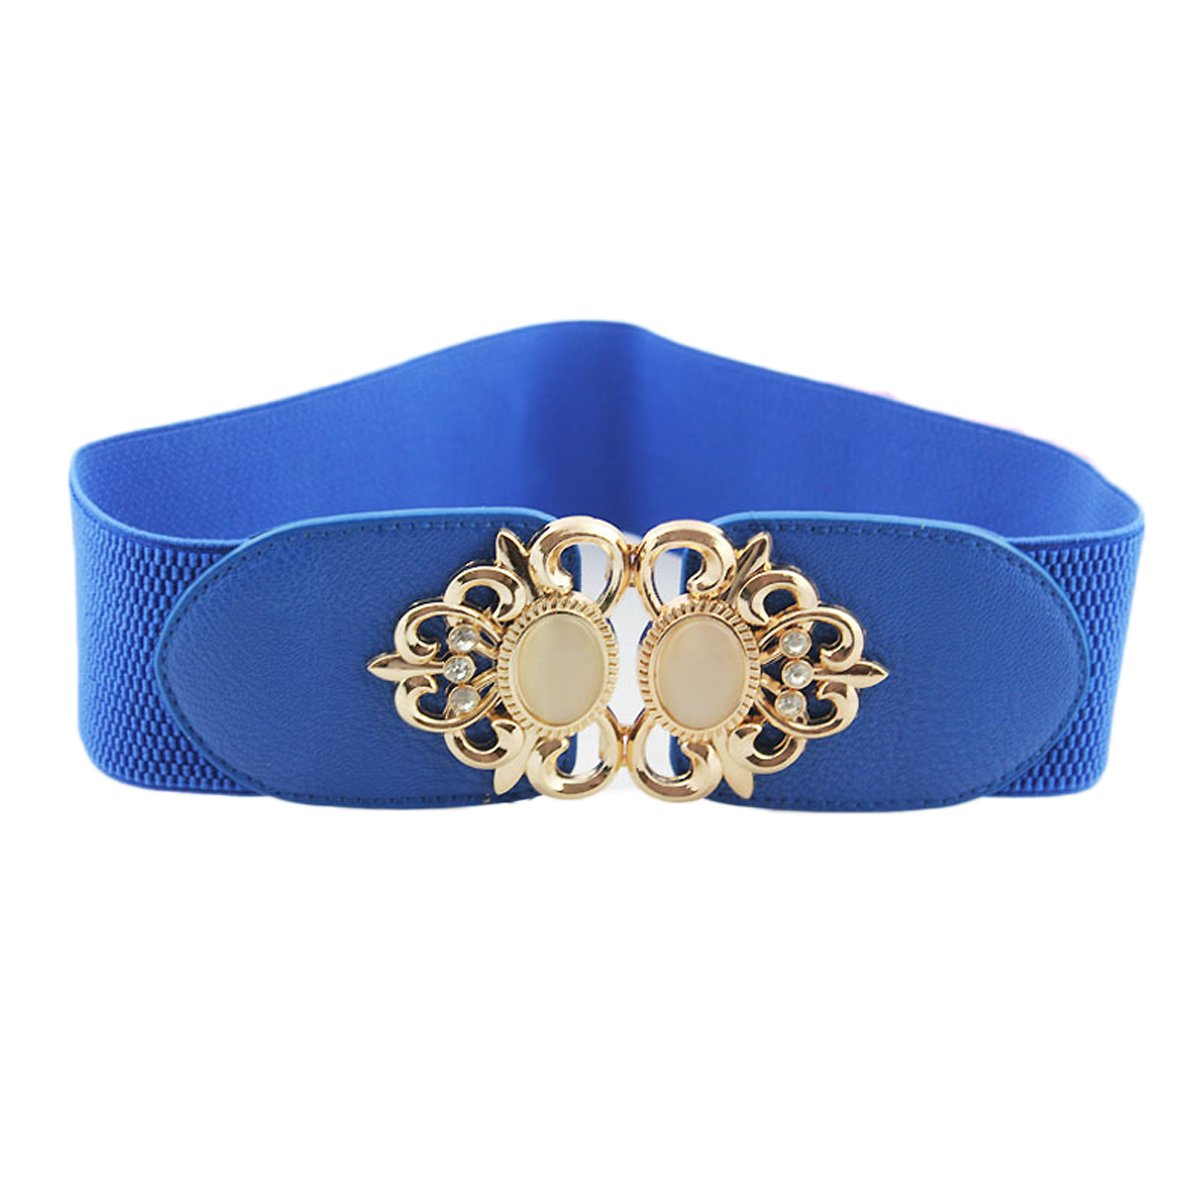 f21b8734756 Womtop Women Belts 3 PCS Vintage Waist Belt Wide Elastic Stretch Retro  Cinch Belt for Women (Beige+Blue+Red) at Amazon Women s Clothing store